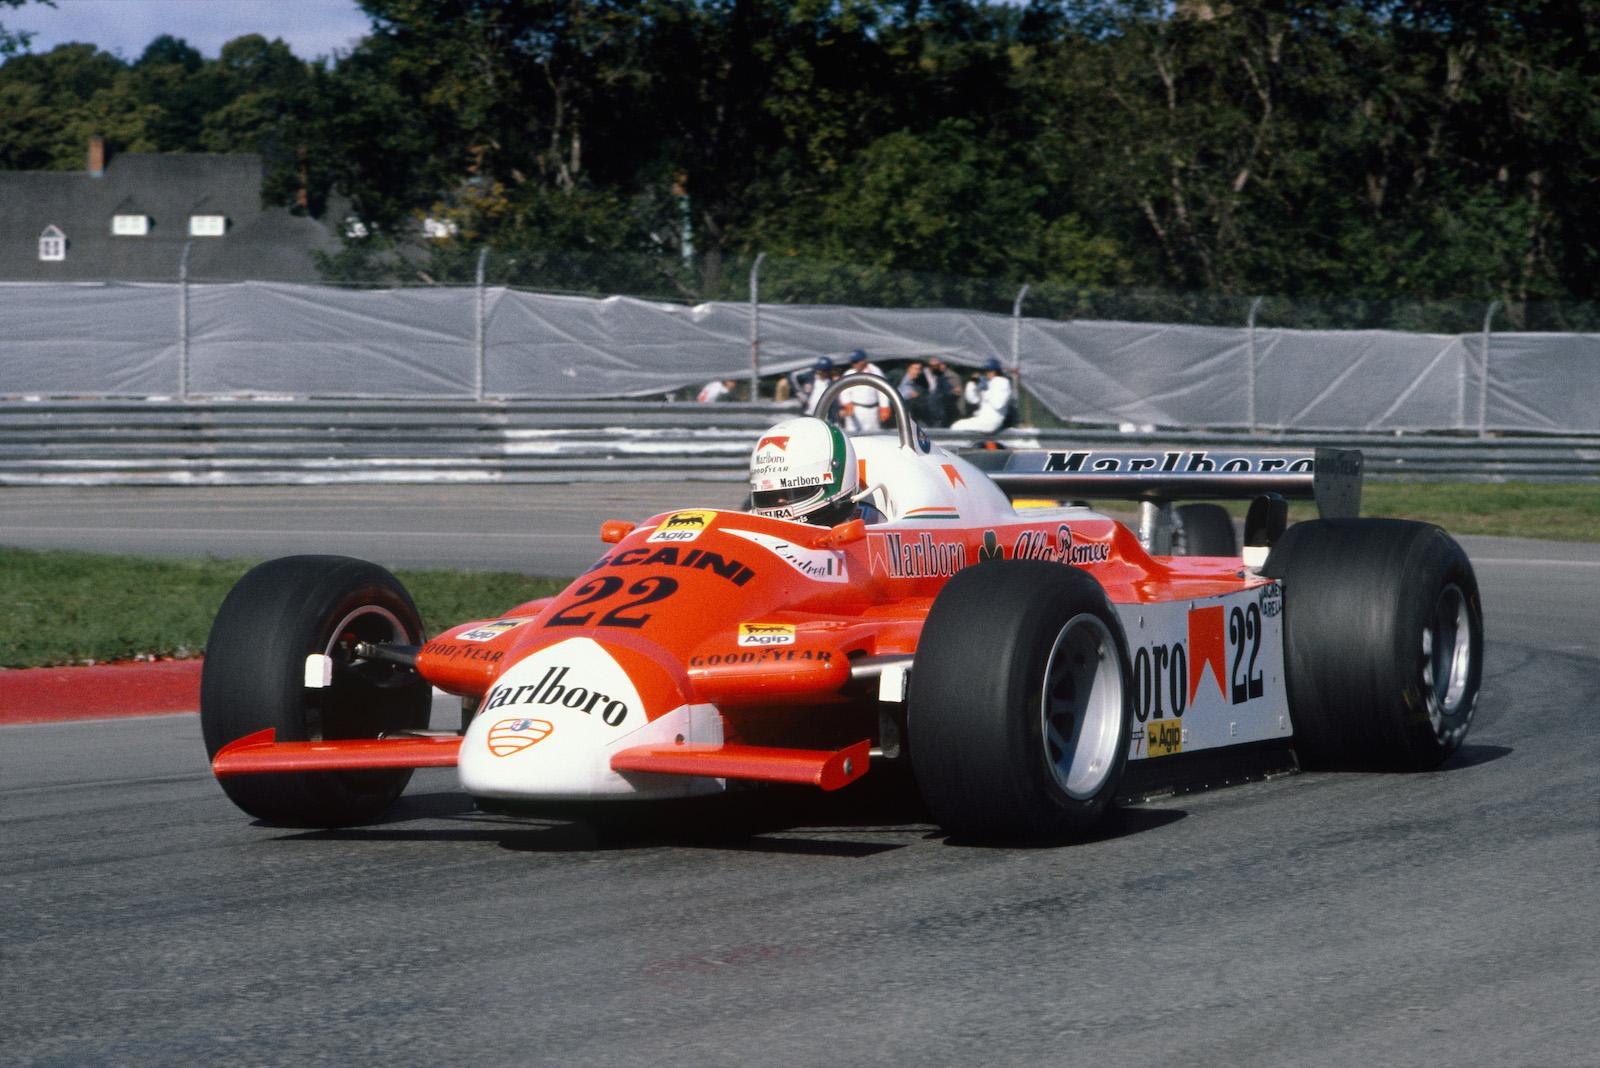 LAT Archive: Alfa Romeo returns to Formula 1